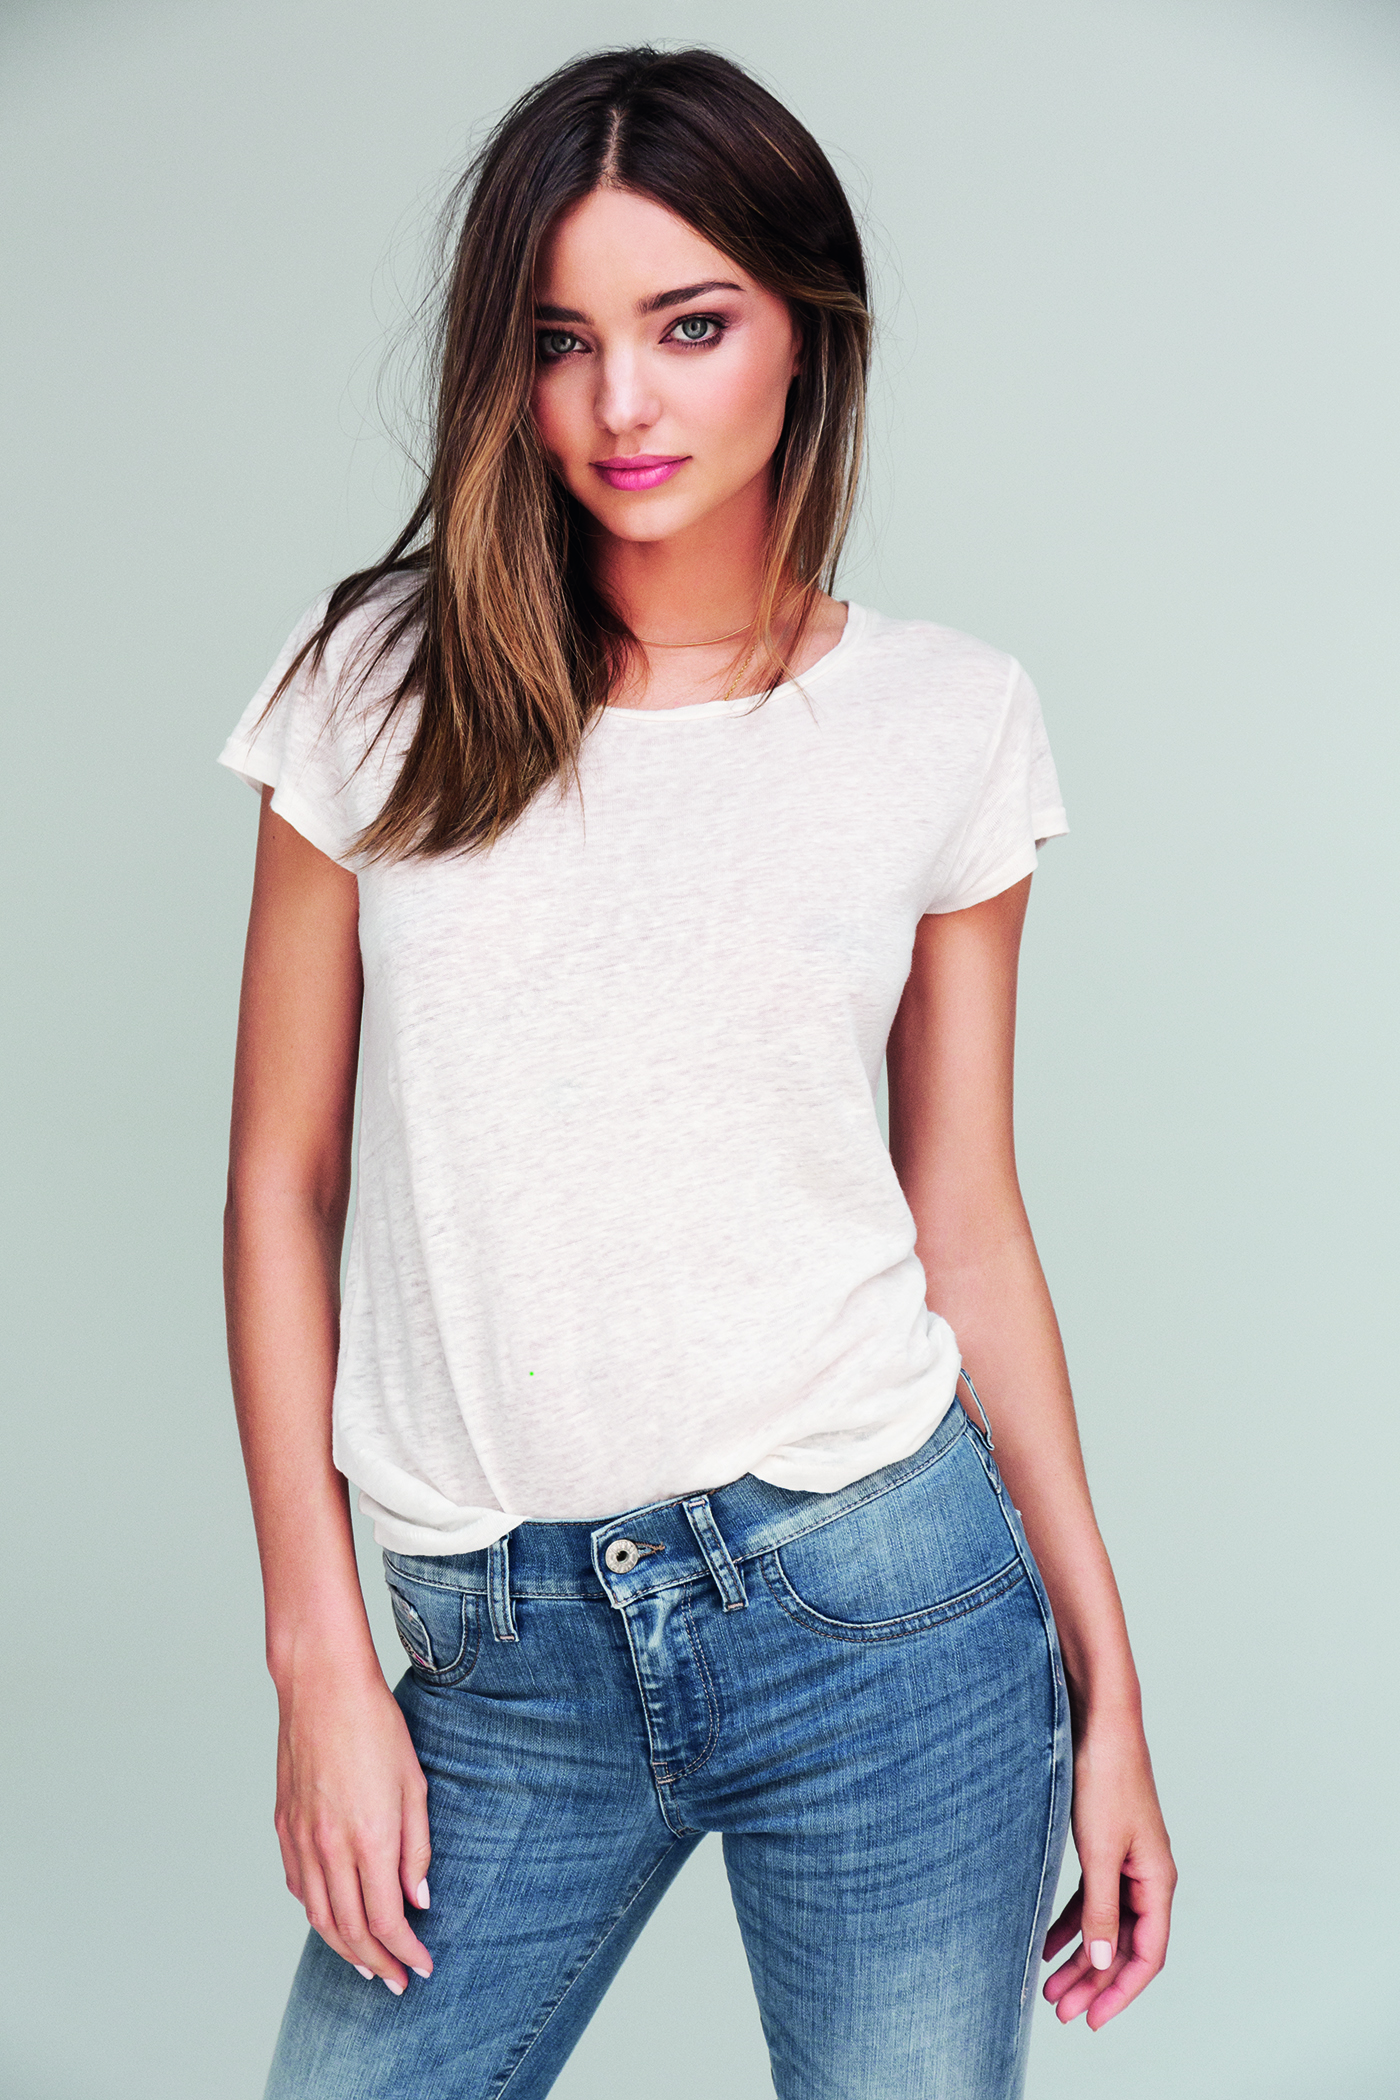 Miranda Kerr - Page 1243 - Female Fashion Models - Bellazon Miranda Kerr Bellazon